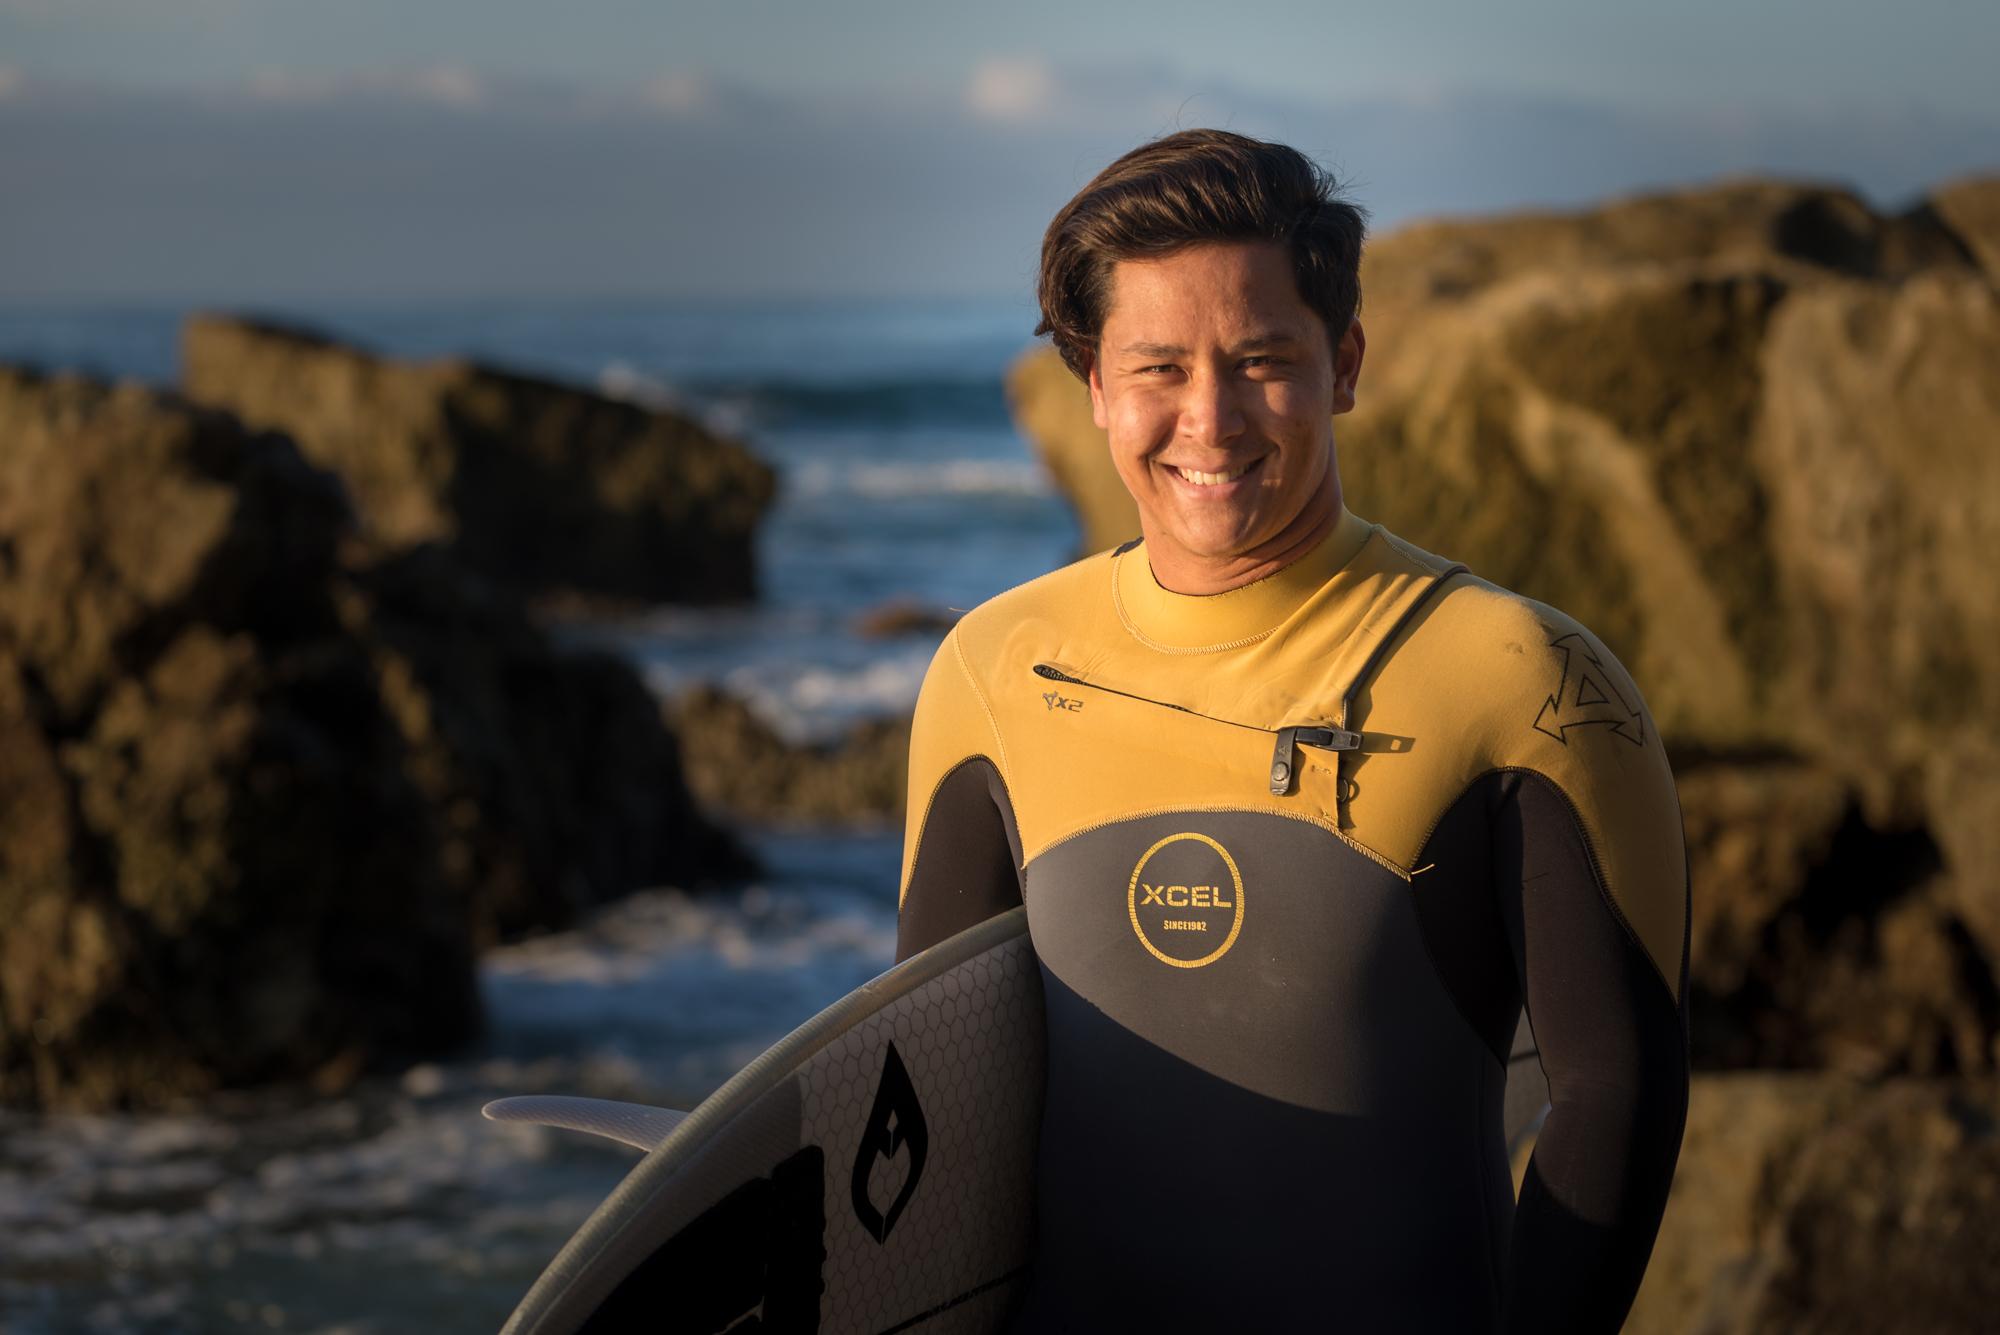 Surfer-Environmental-Portrait_Active-Lifestyle-Photography008.JPG